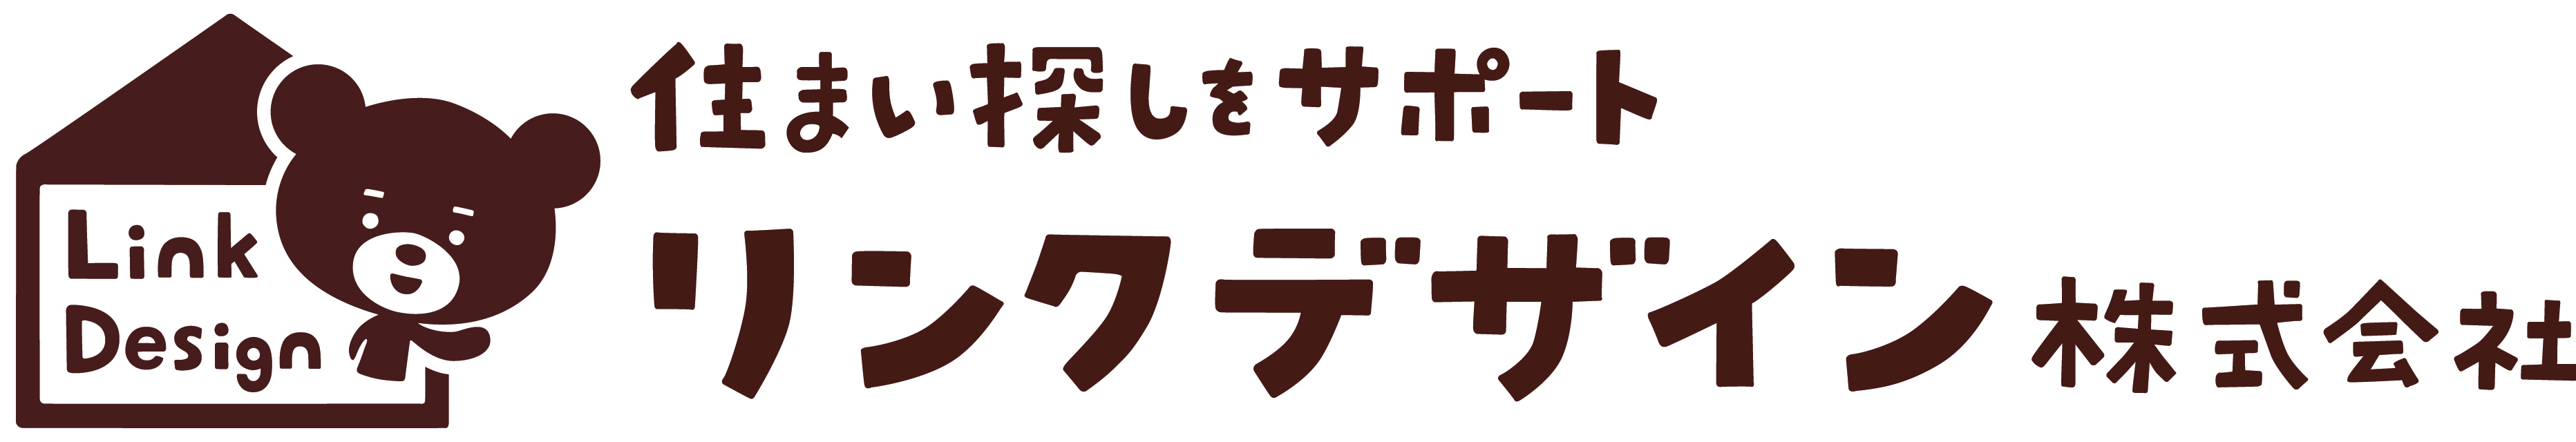 mark_logo.jpg